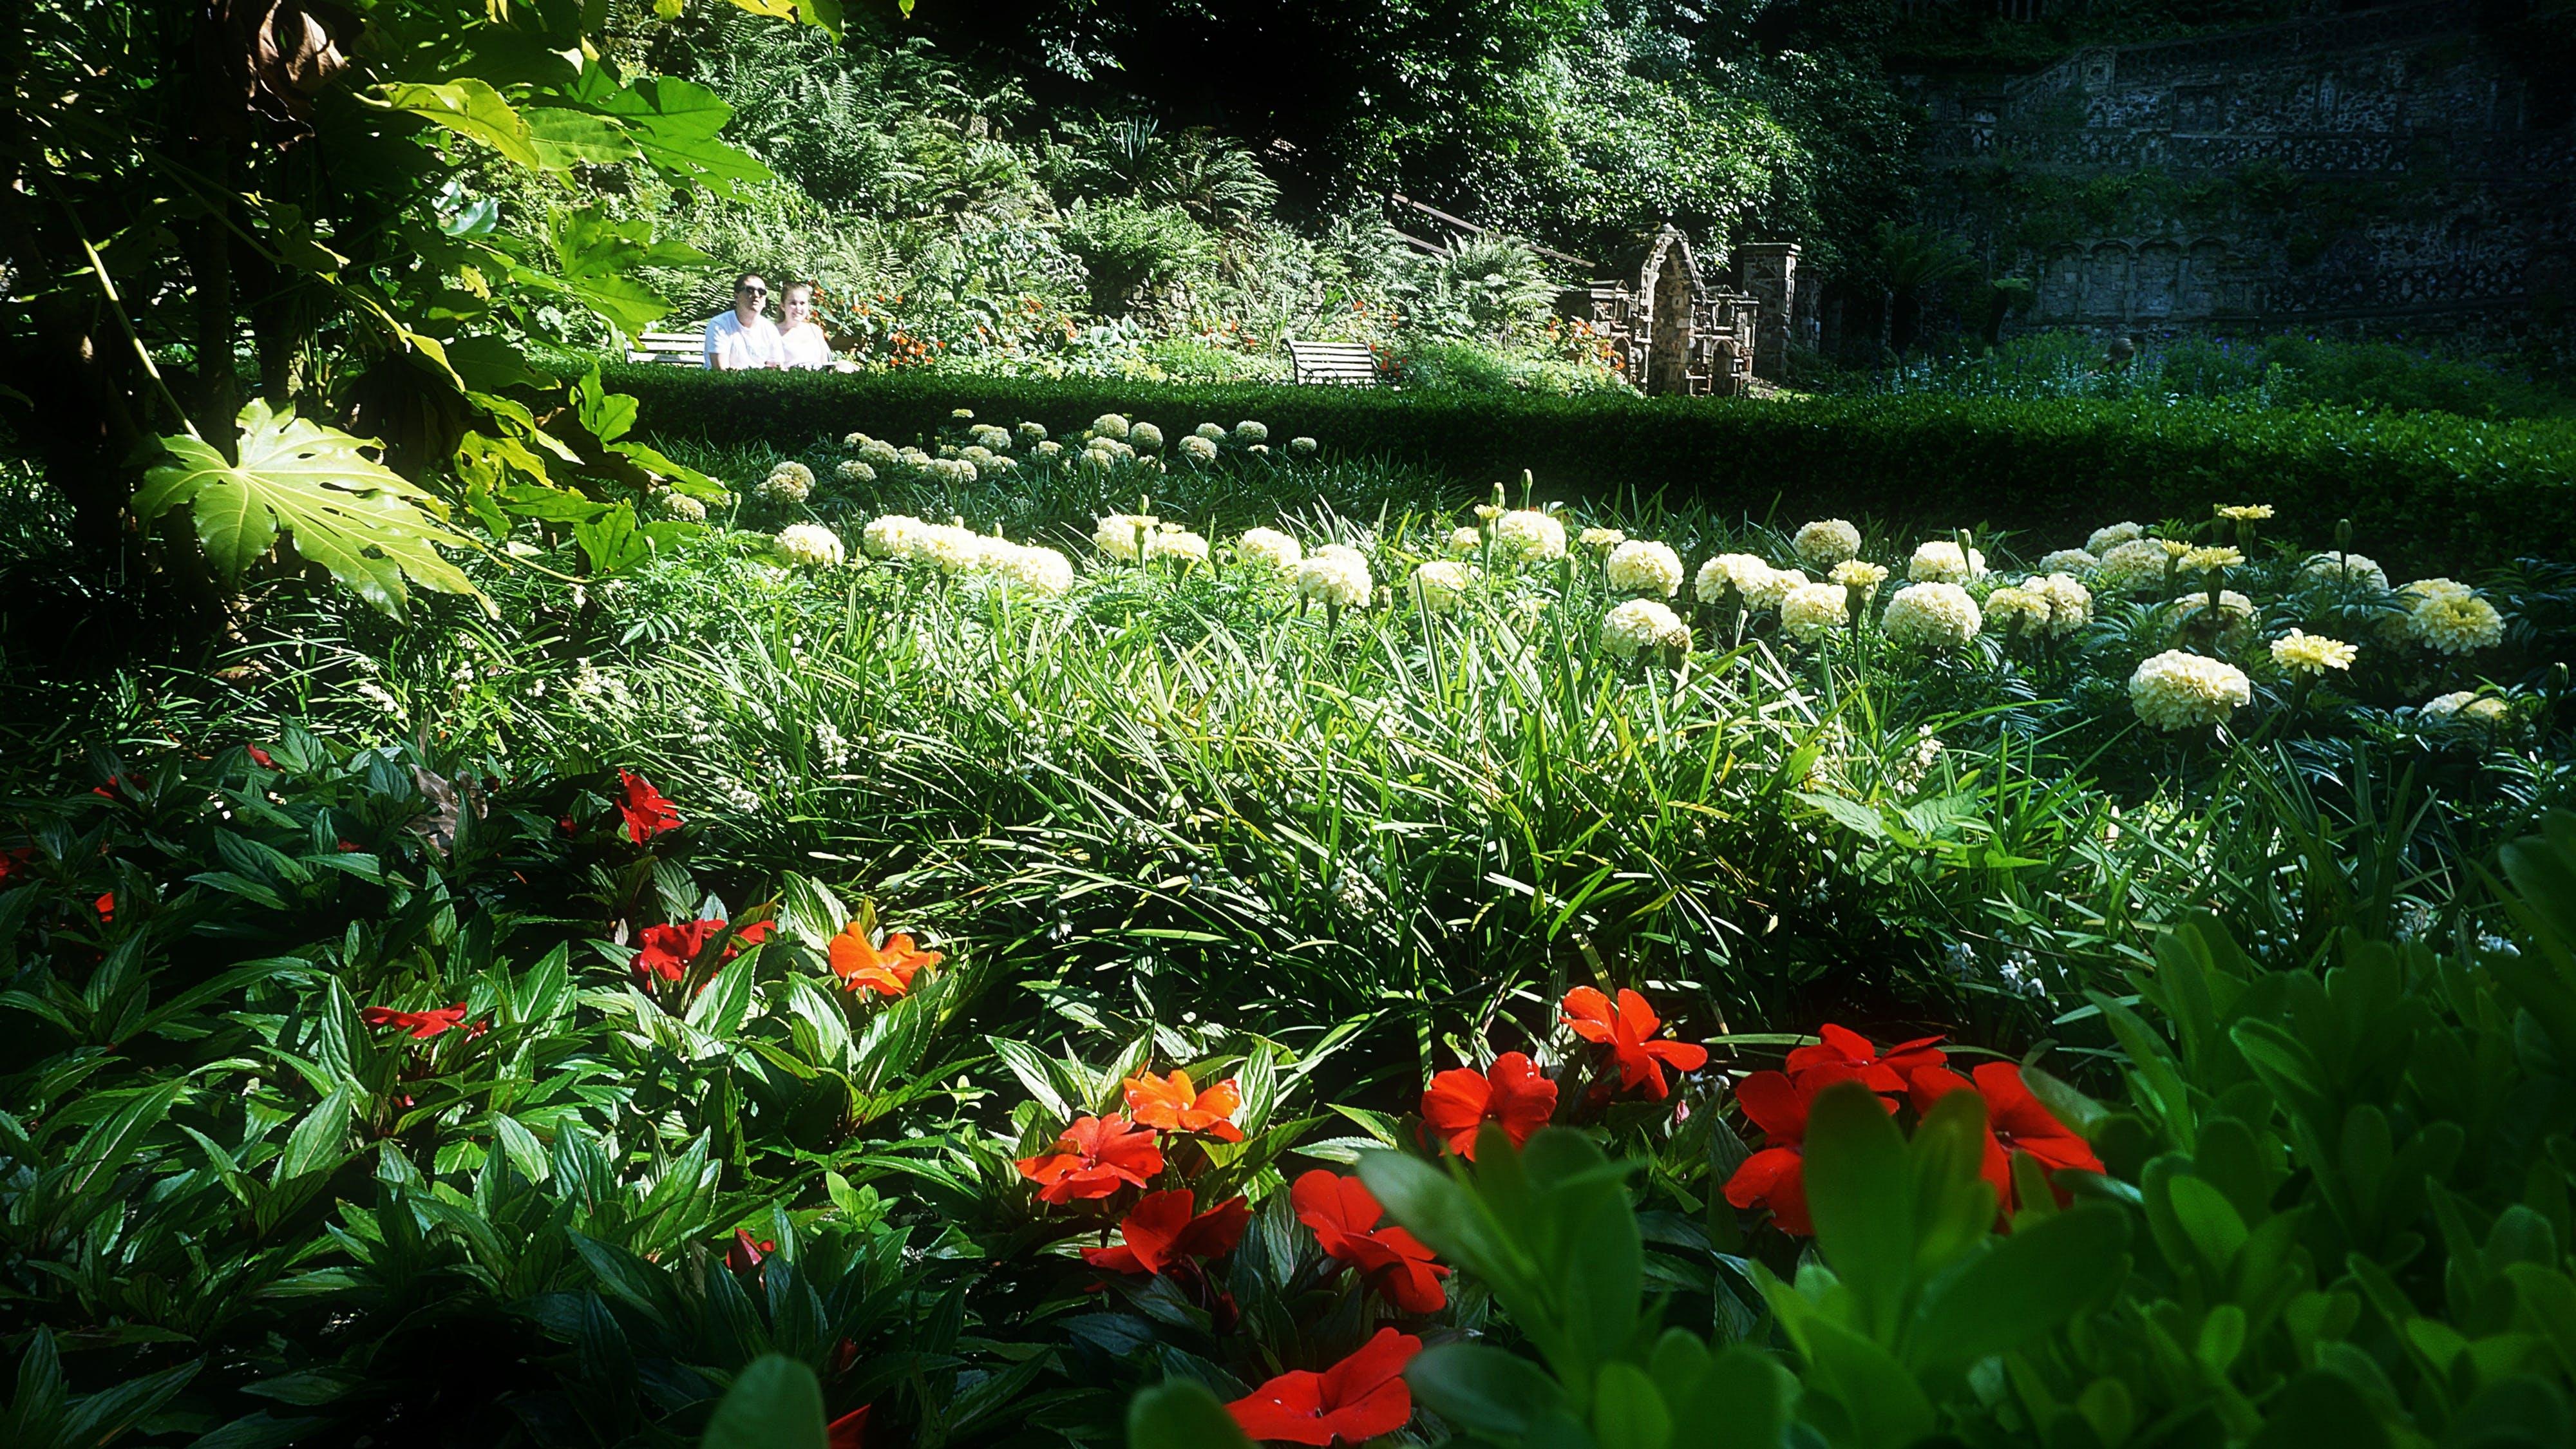 Free stock photo of flowers, summer, garden, park